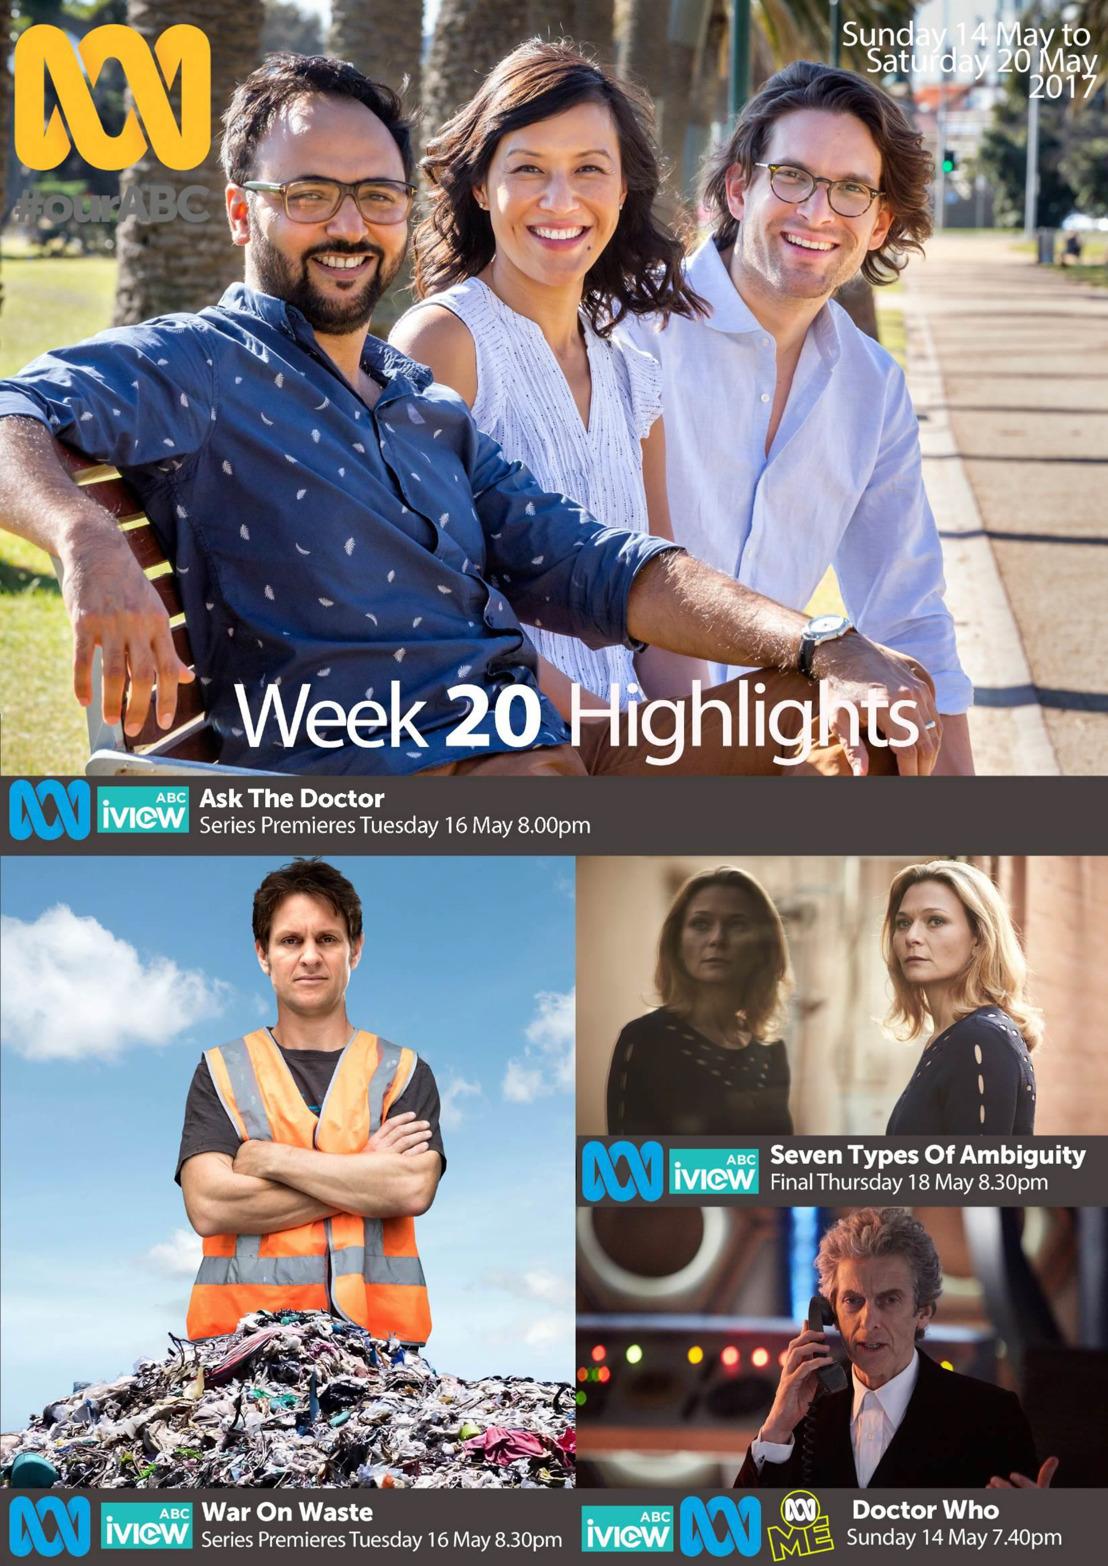 ABC Program Highlights - Week 20